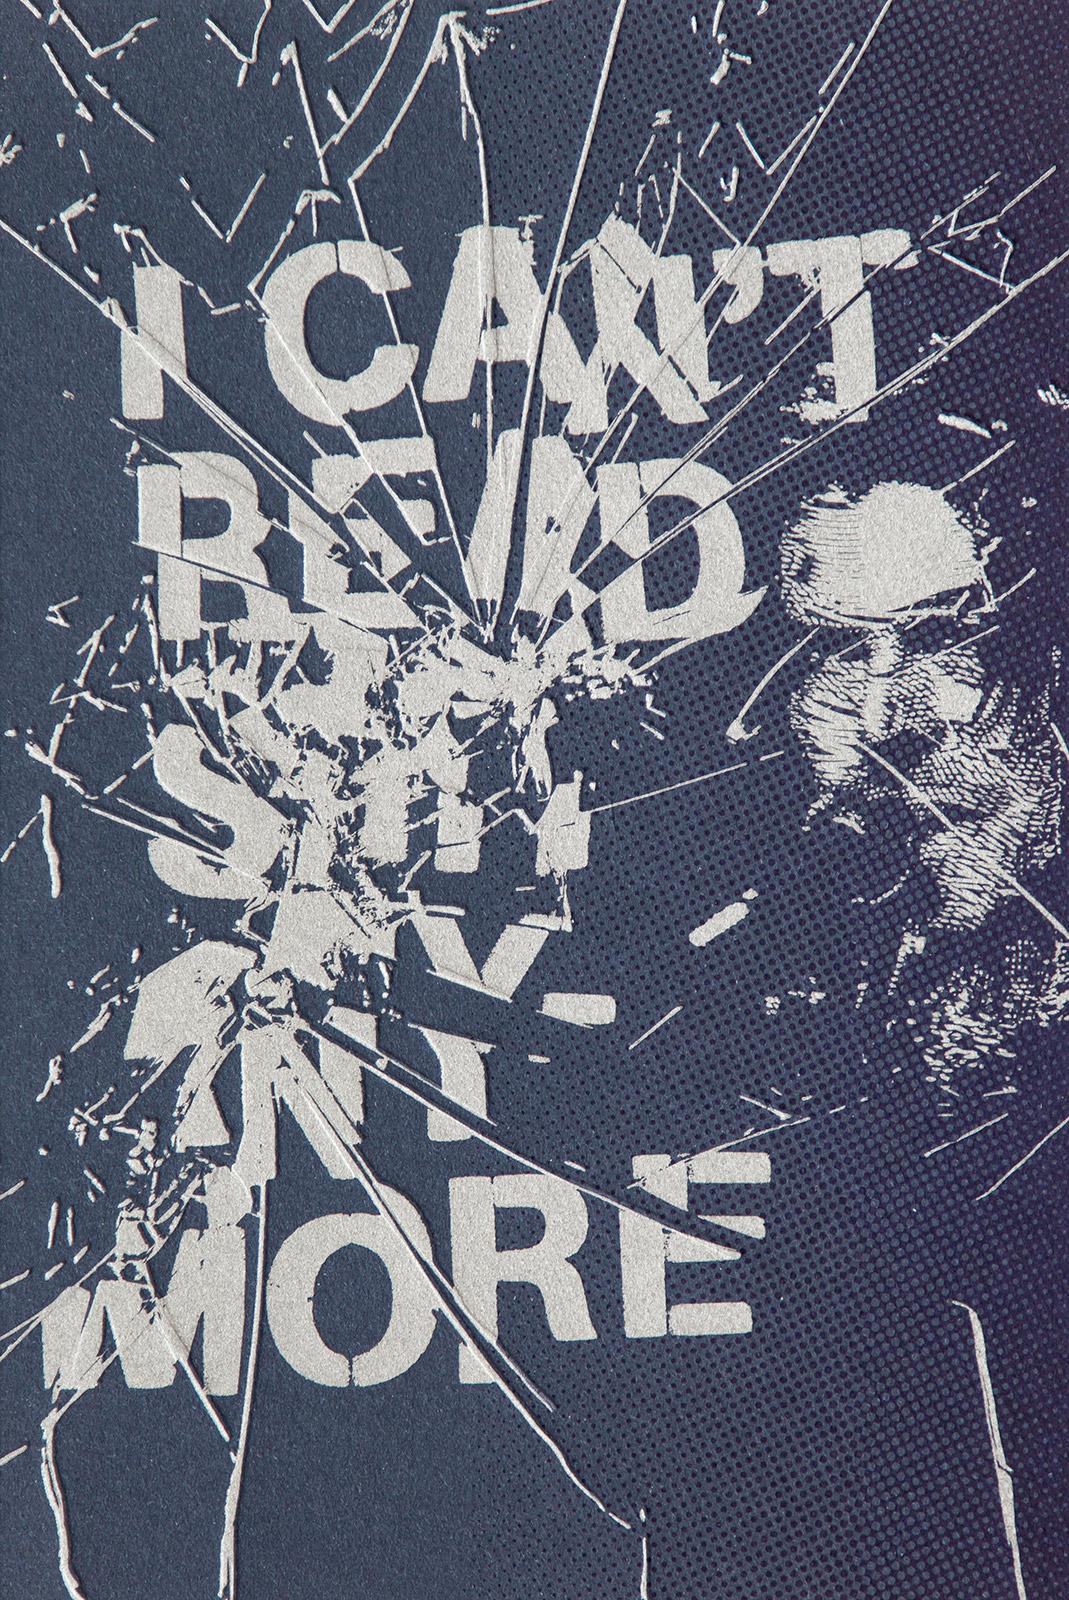 Bowie-Art-Print-Letterpress-cantread-0